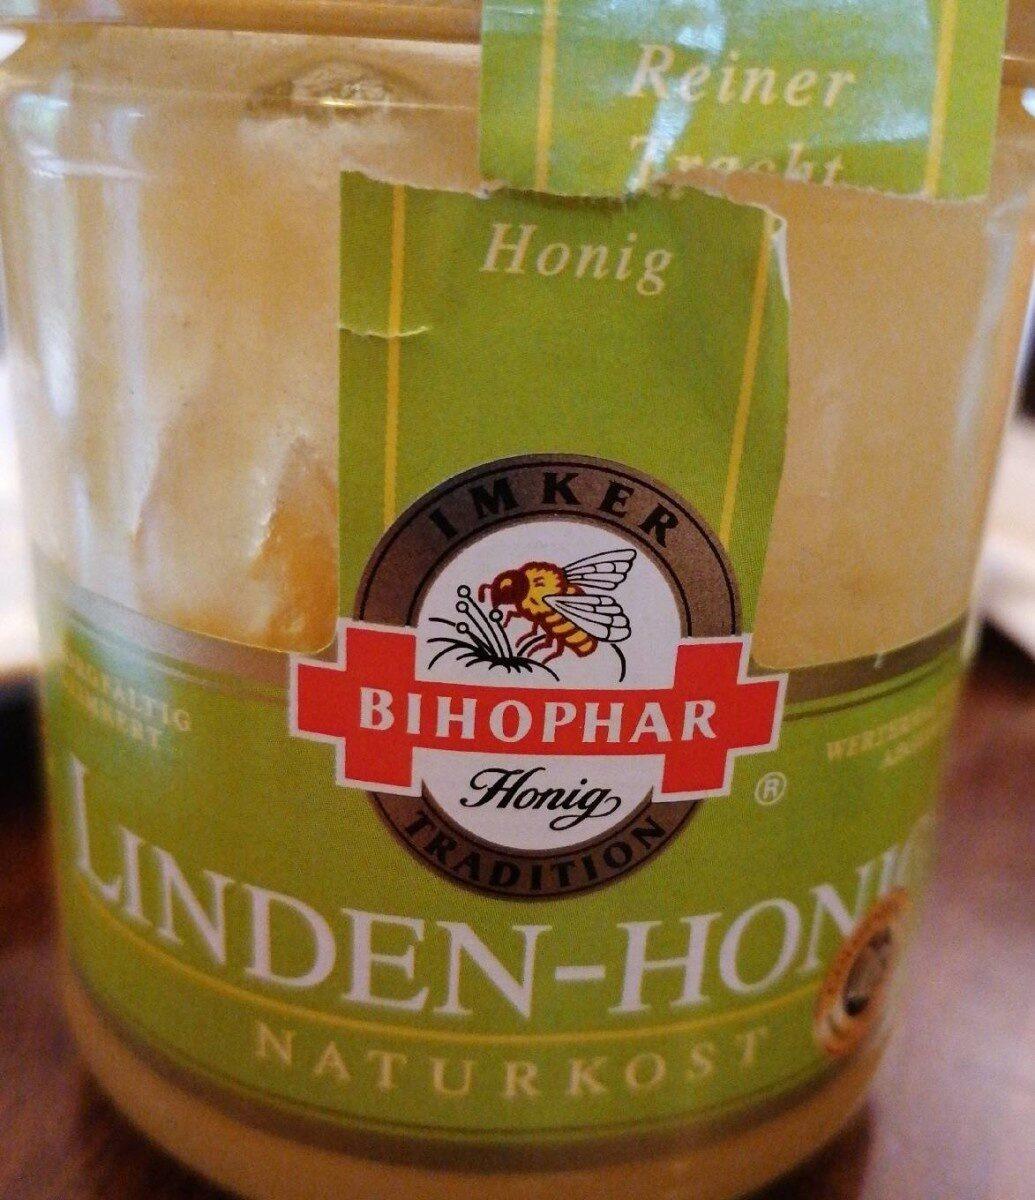 Linden-Honig - Product - en